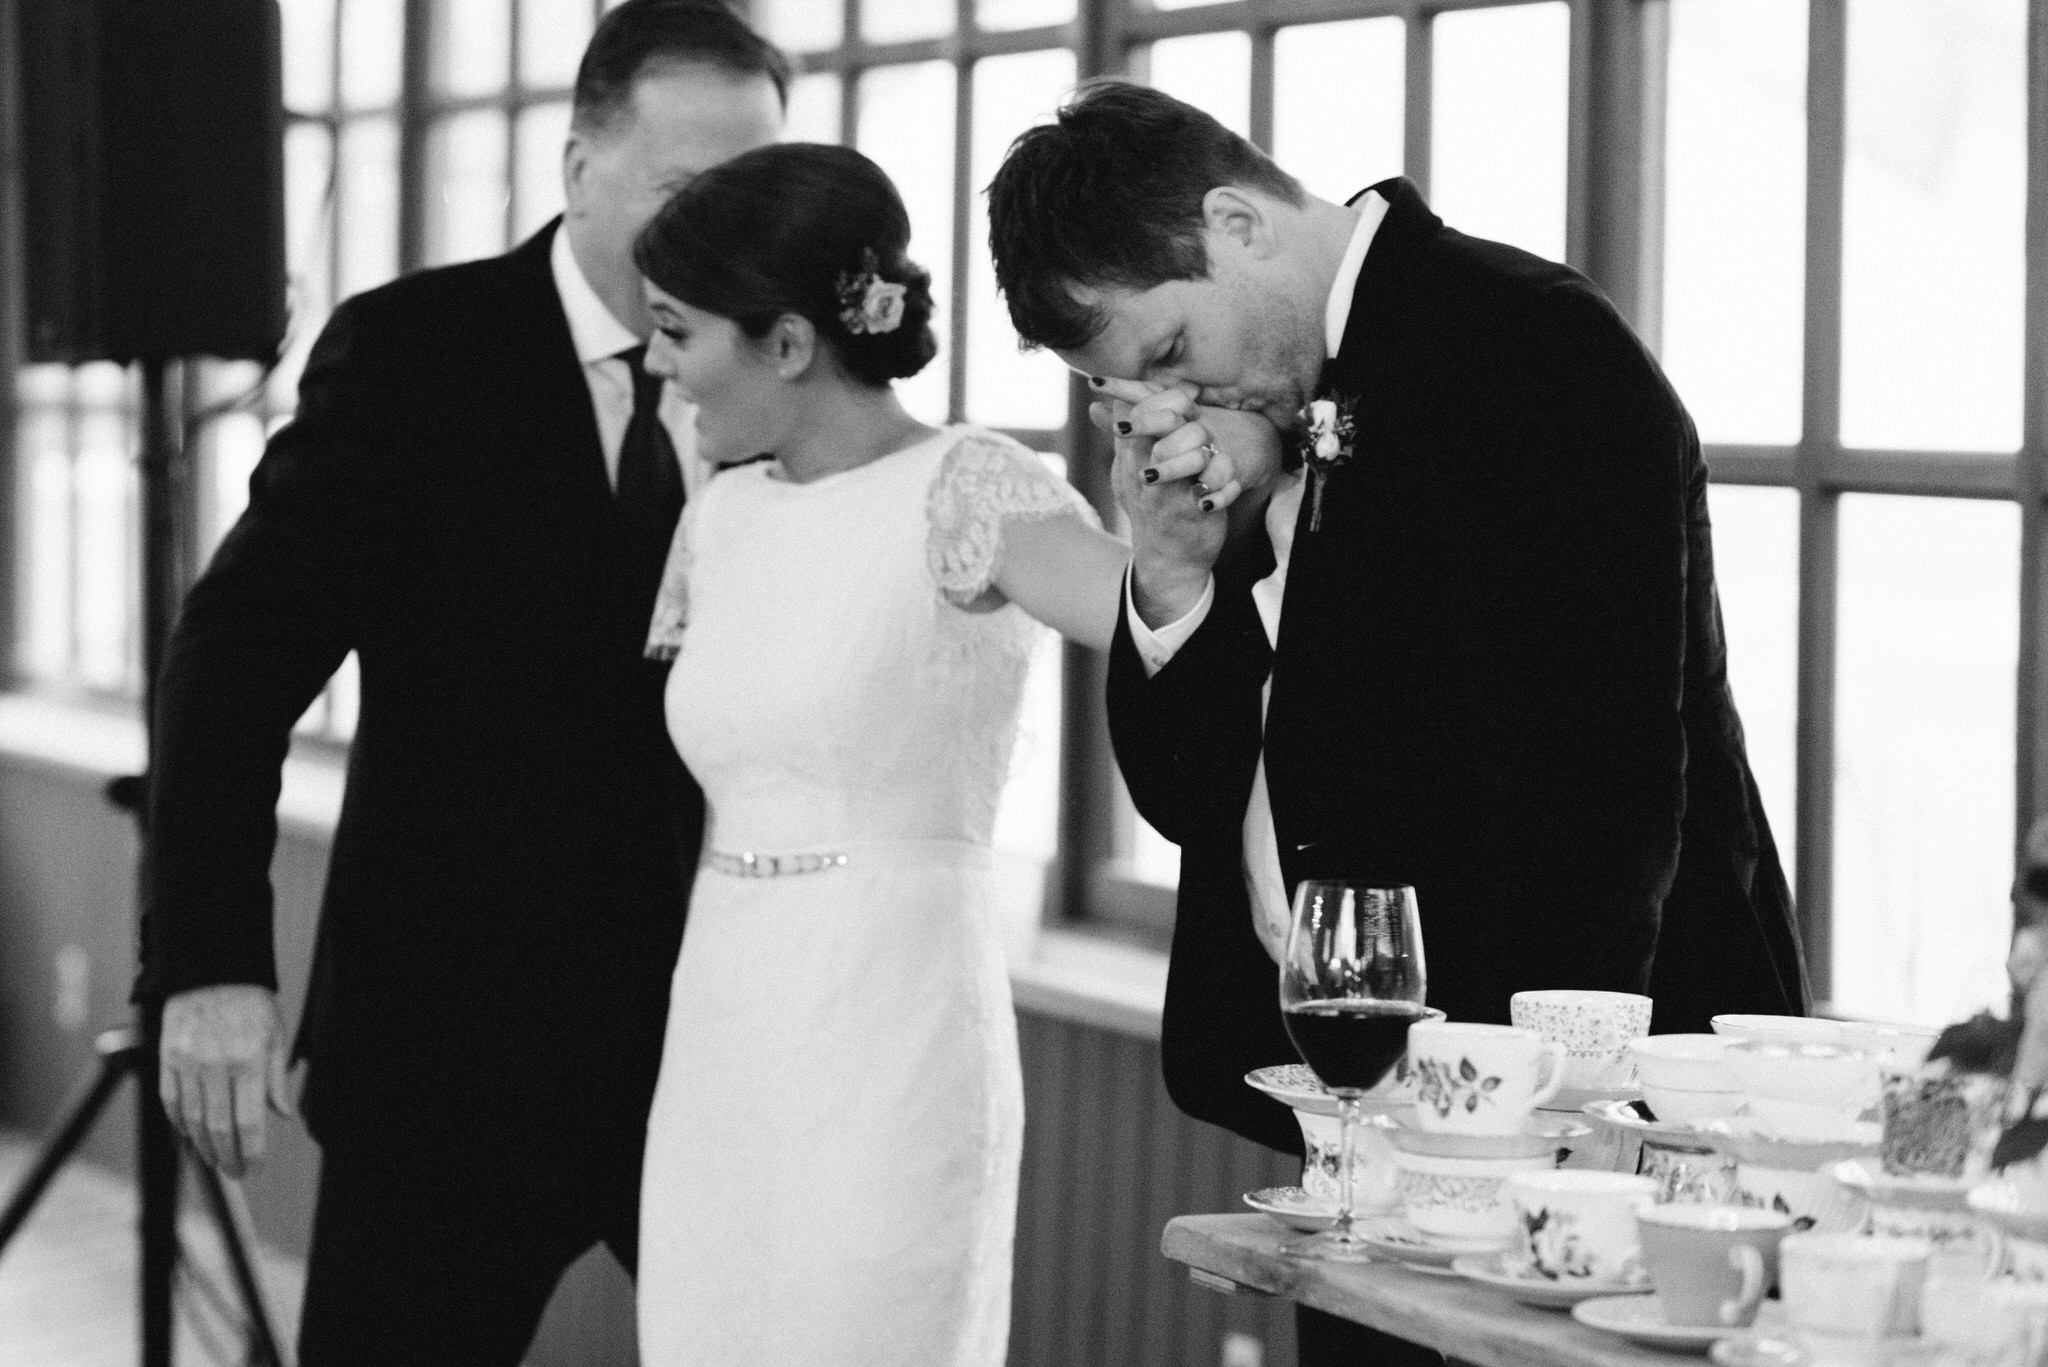 scarletoneillphotography_weddingphotography_prince edward county weddings147.JPG